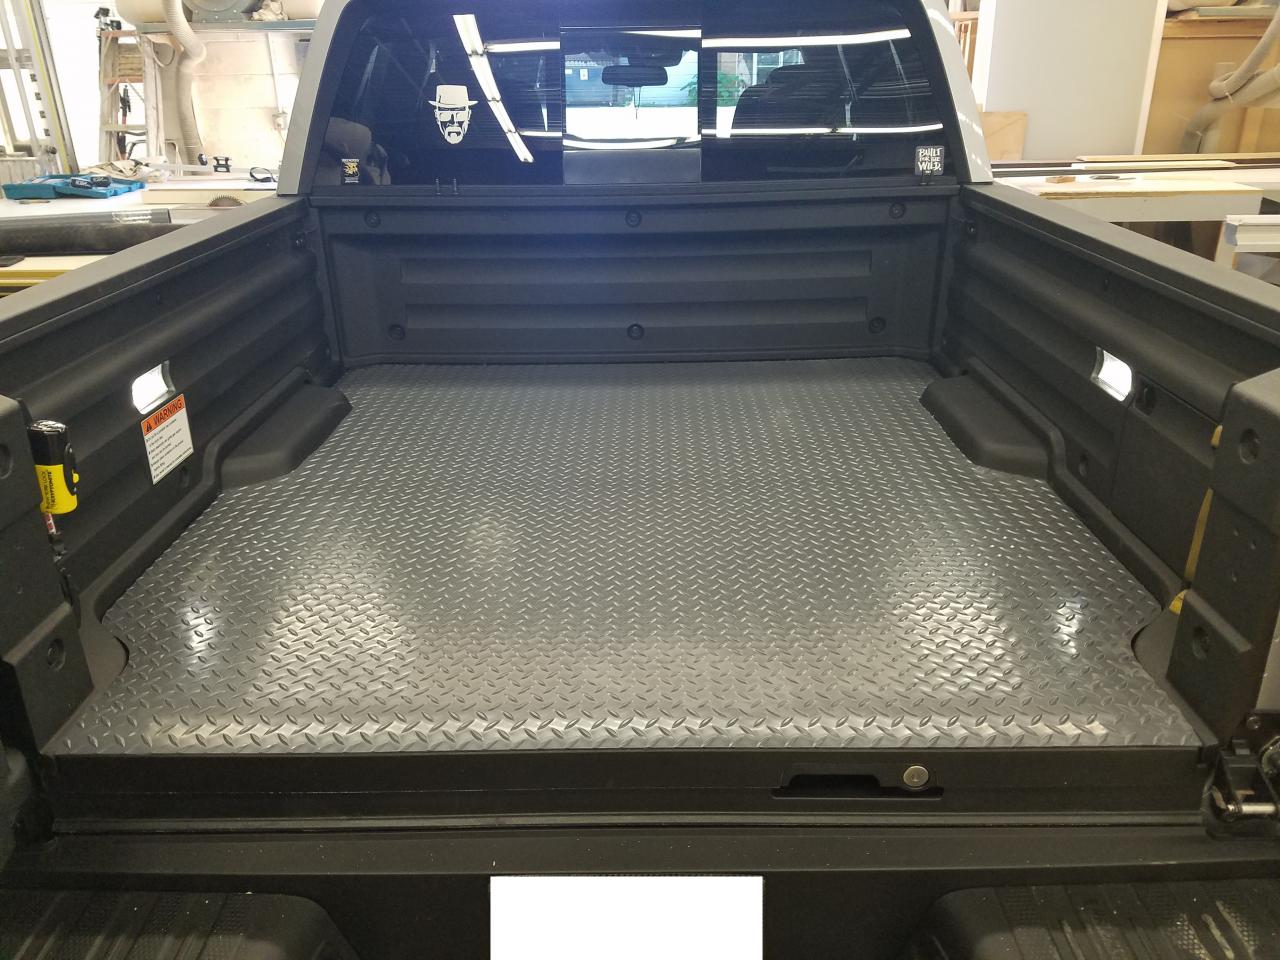 Image Result For Honda Ridgeline Bed Dimensions